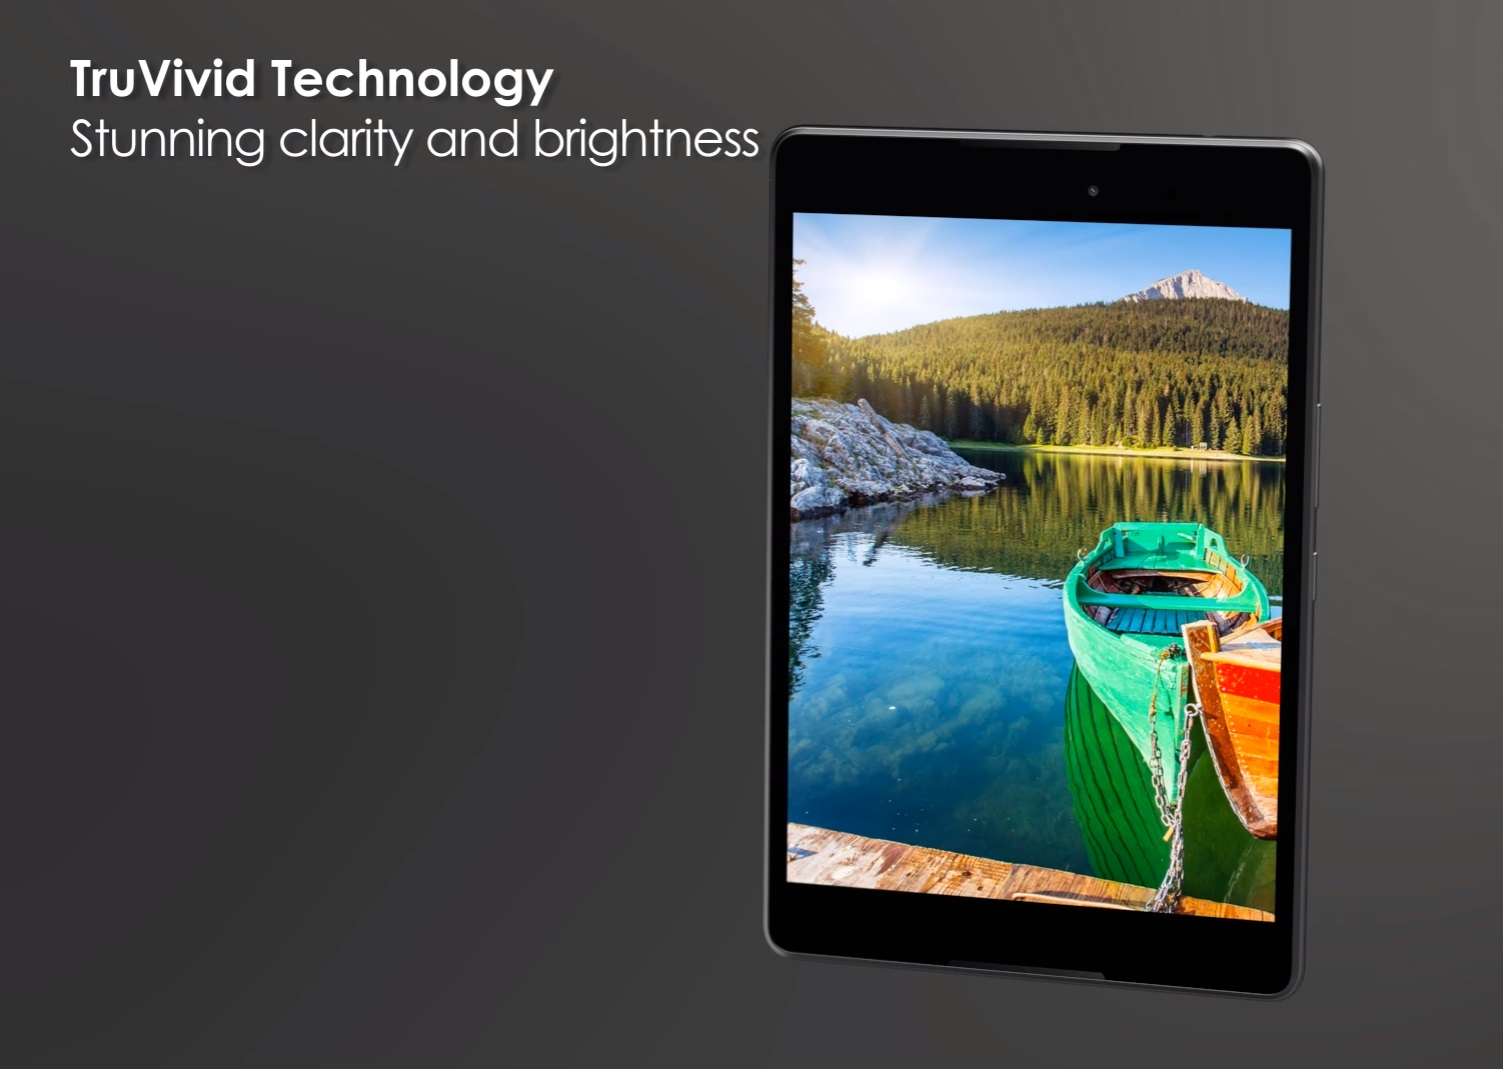 ASUS เปิดตัว ZenPad 3 8.0 แท็บเล็ตที่มีหน้าจอความละเอียด 2K ใช้ชิป Snapdragon 650 และแรม 4 GB !!